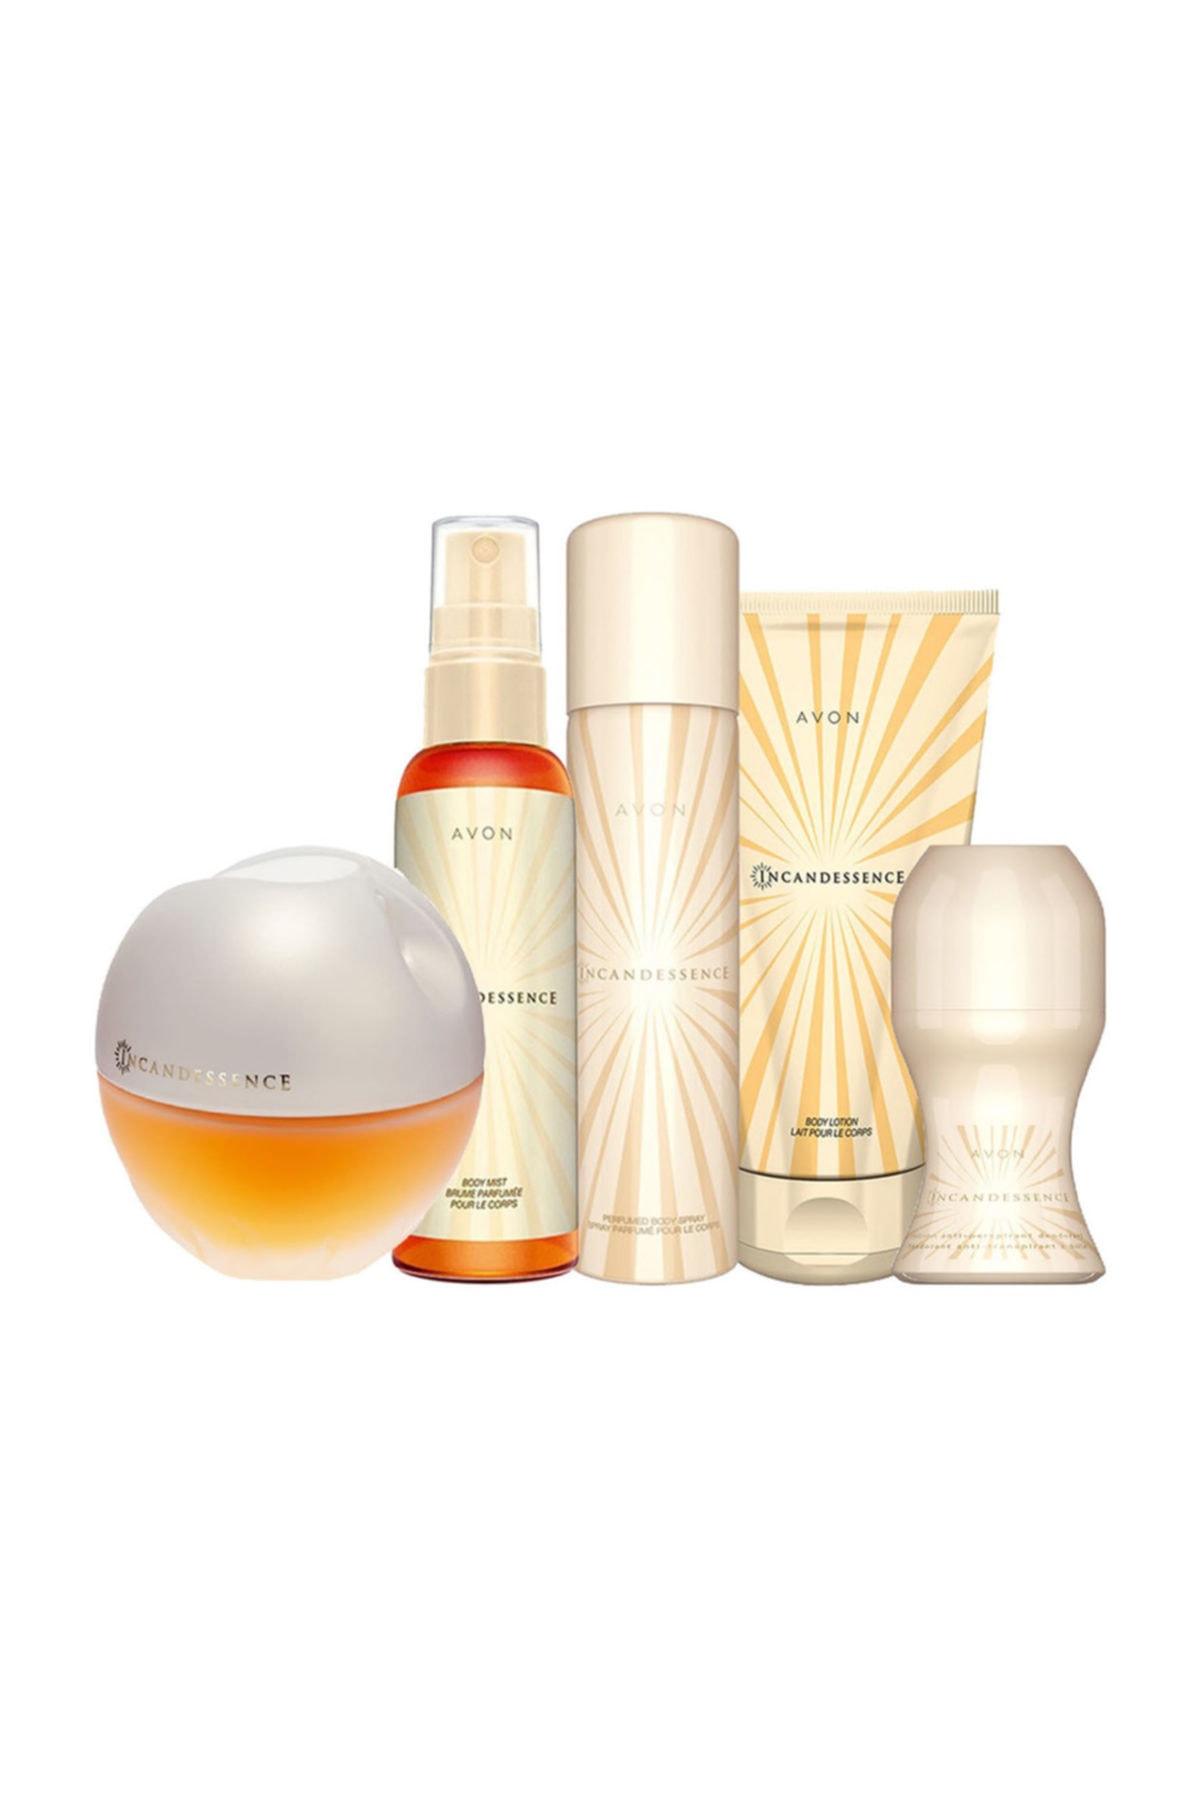 Avon Incandessence Edp 50 Ml Women 'S Perfume 5'Li Set Economic New Season Care For Women Sexy Passionate Modal 2021 недорого